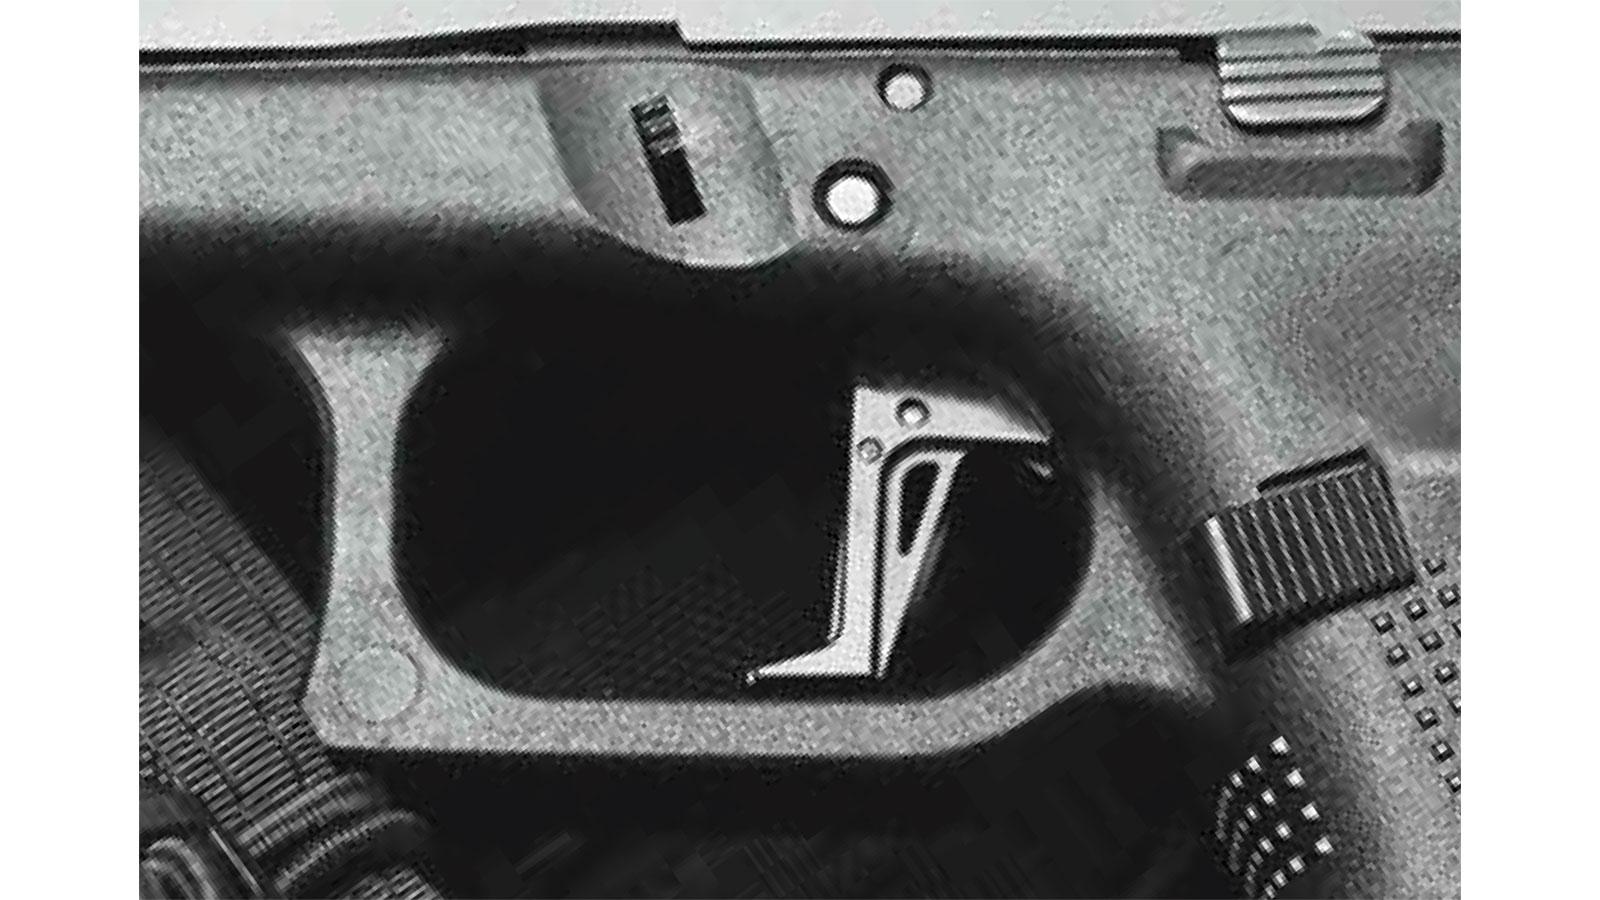 CMC Triggers 71701 Glock Gen 4 Trigger Assembly 9mm 8620 Steel Black